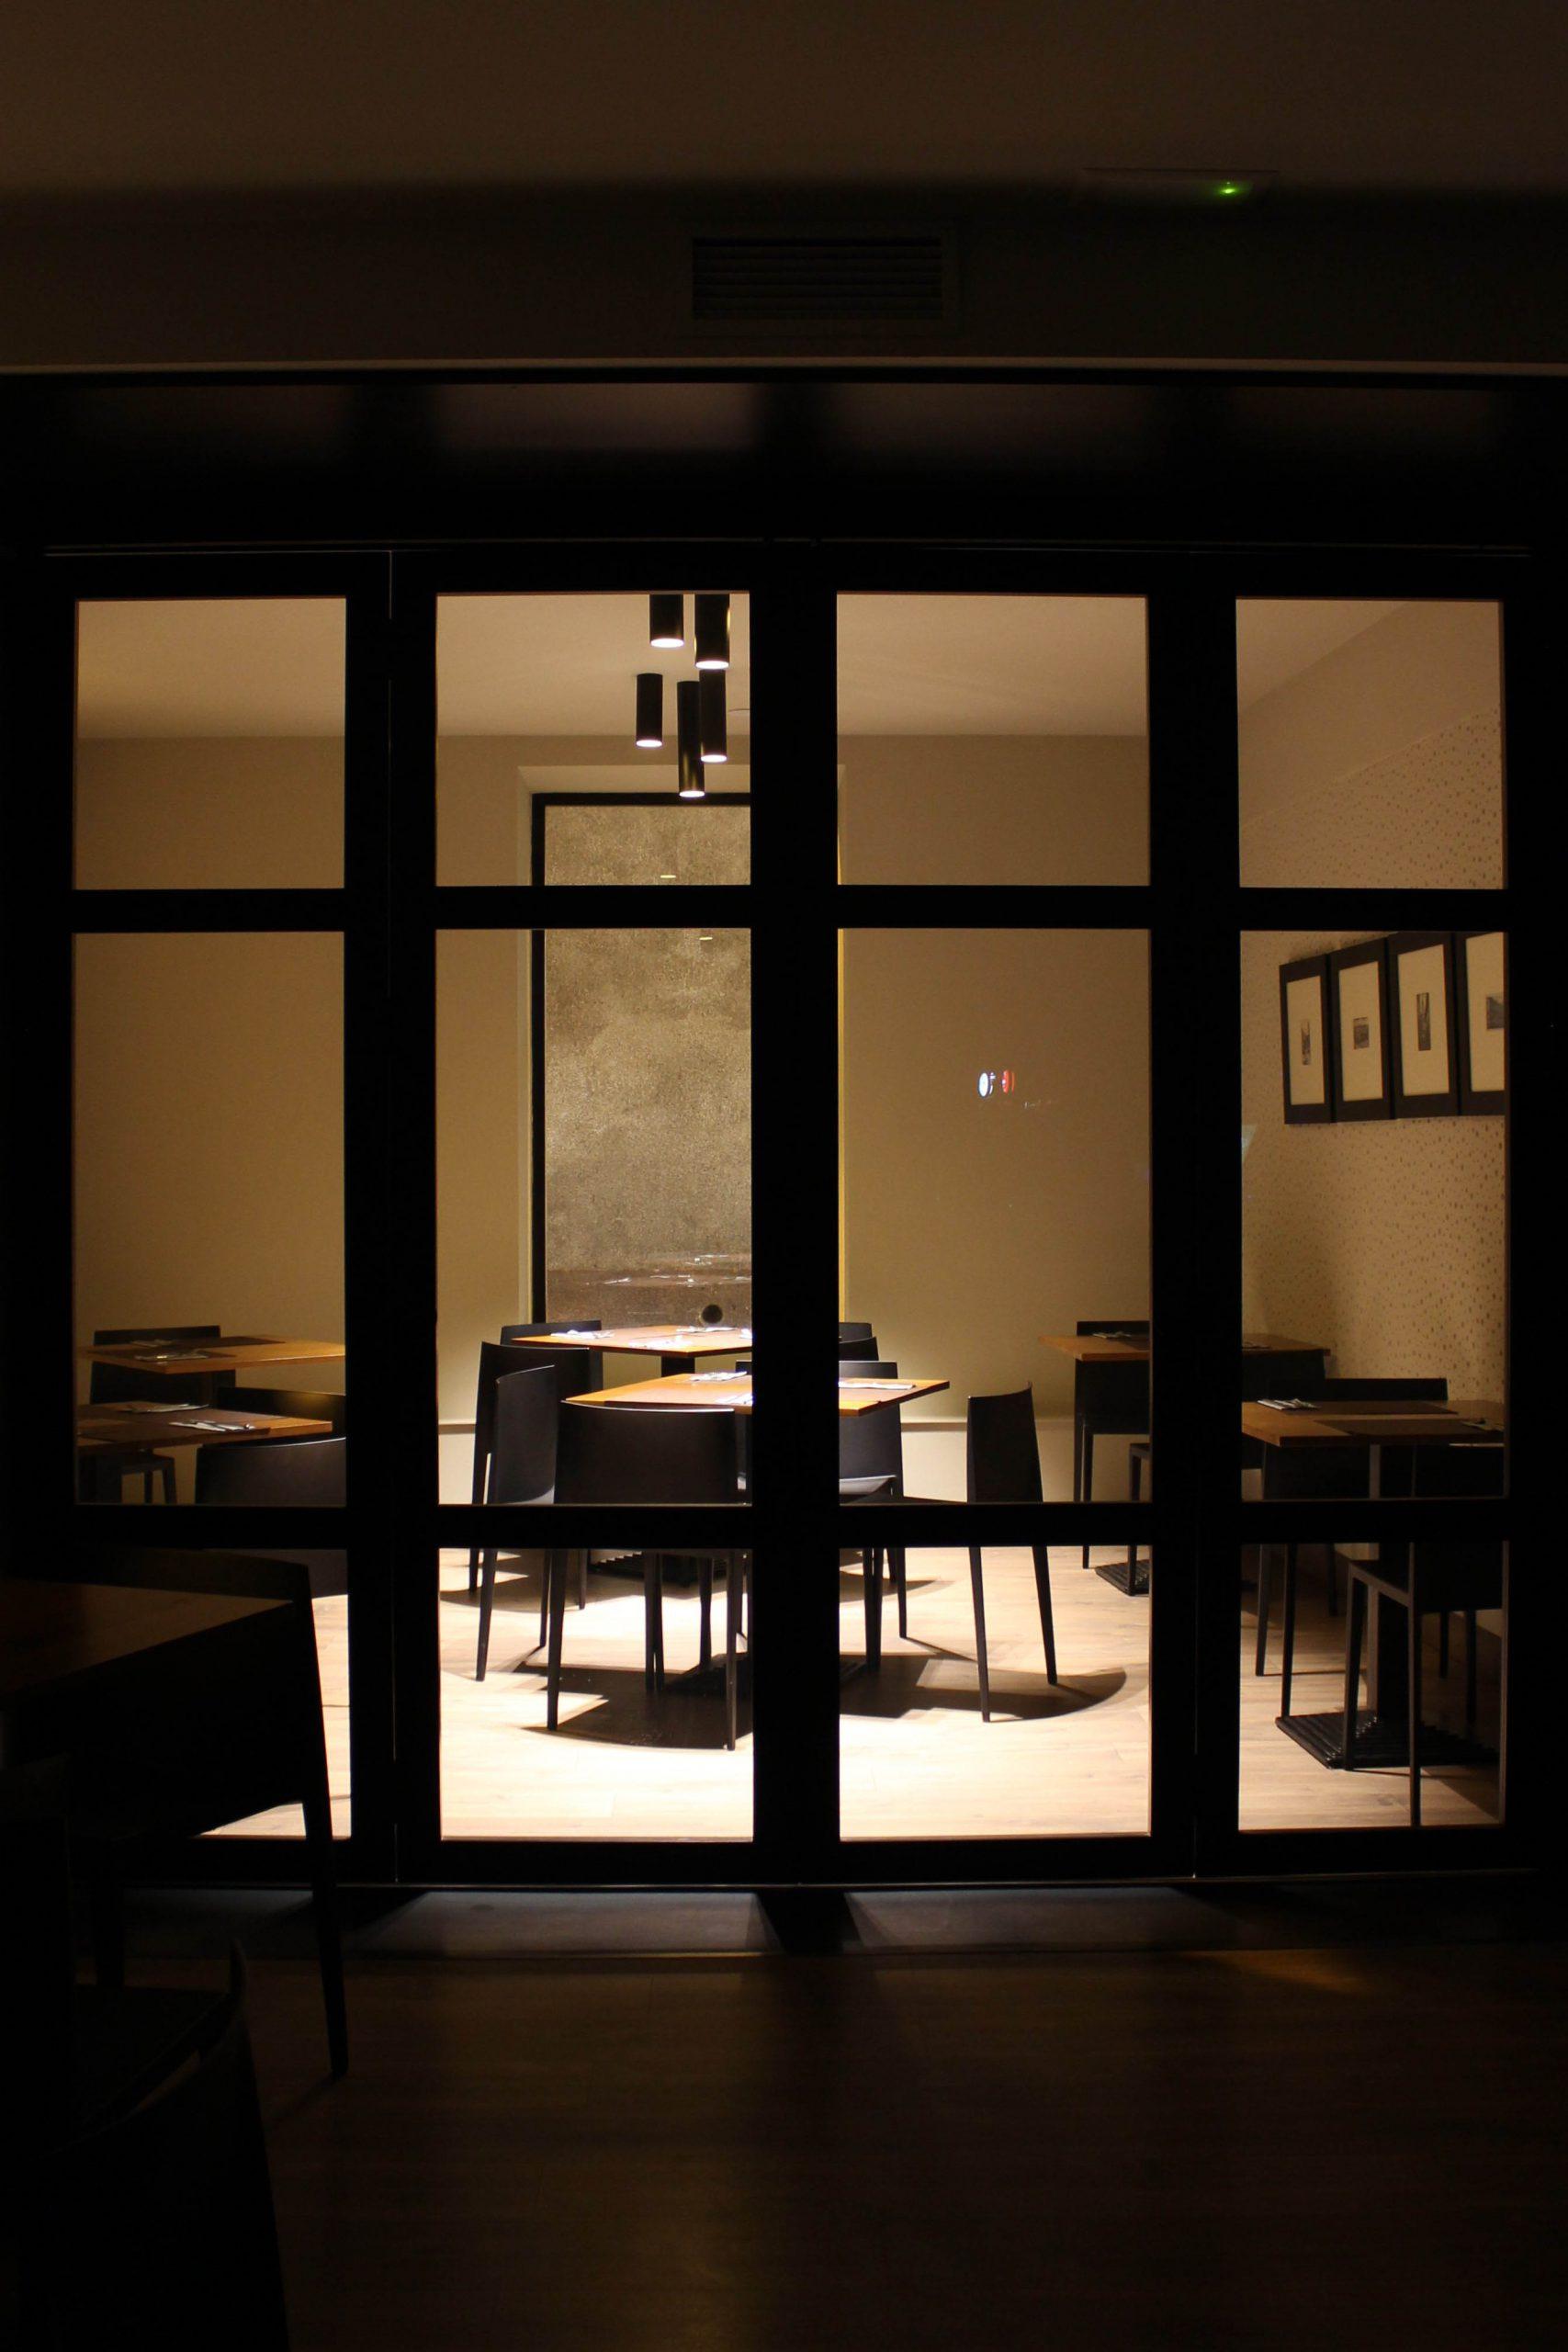 http://gustavolahera.com/wp-content/uploads/2020/11/Foto-4-Restaurante-Ullate-scaled.jpg